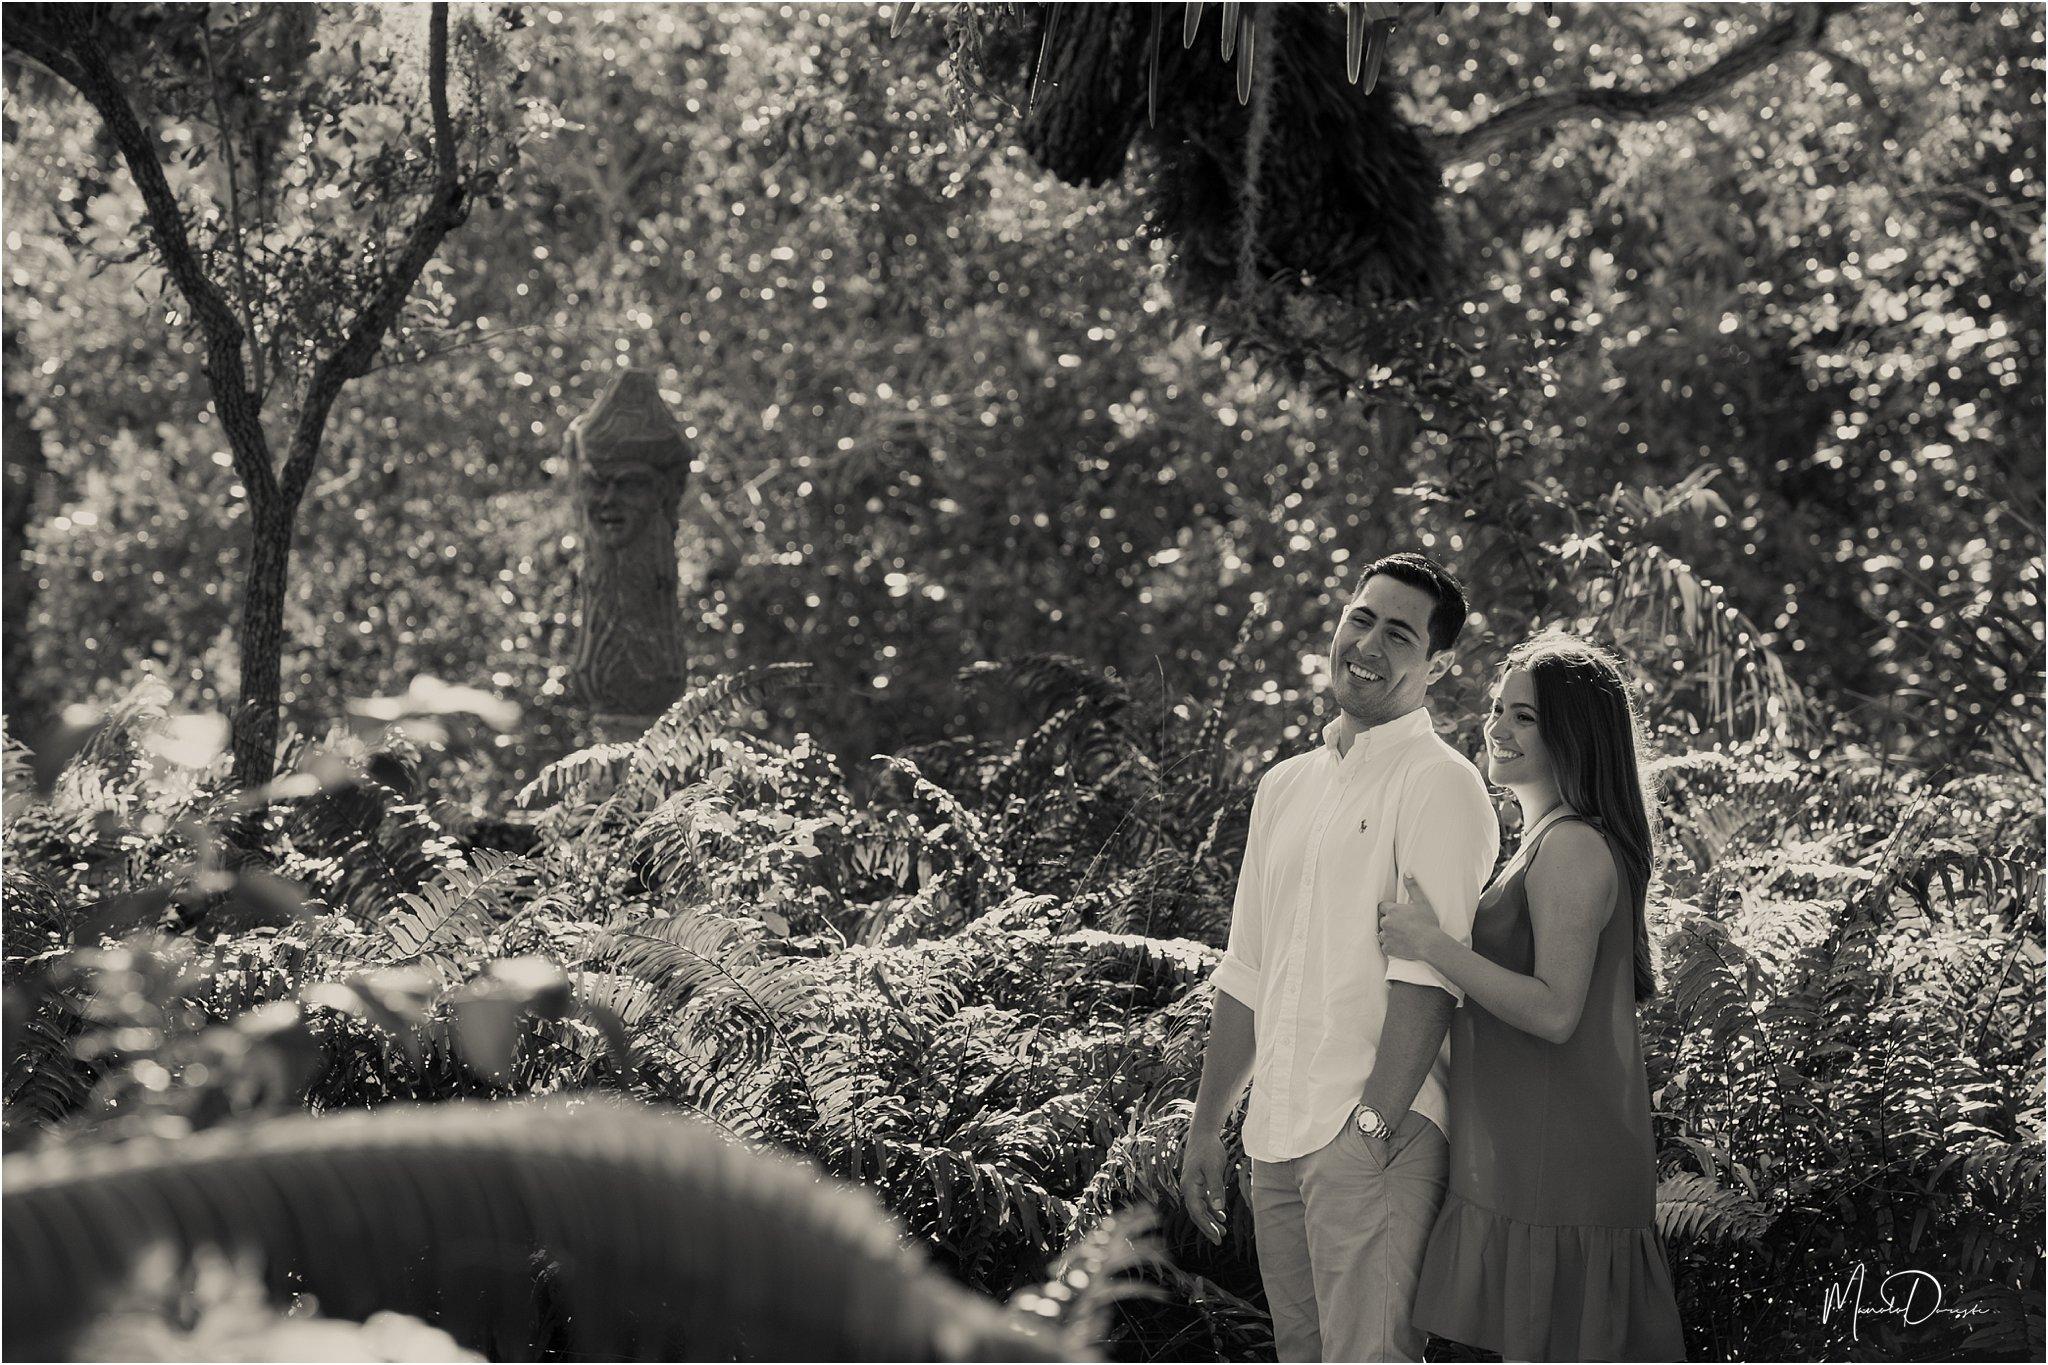 00863_ManoloDoreste_InFocusStudios_Wedding_Family_Photography_Miami_MiamiPhotographer.jpg